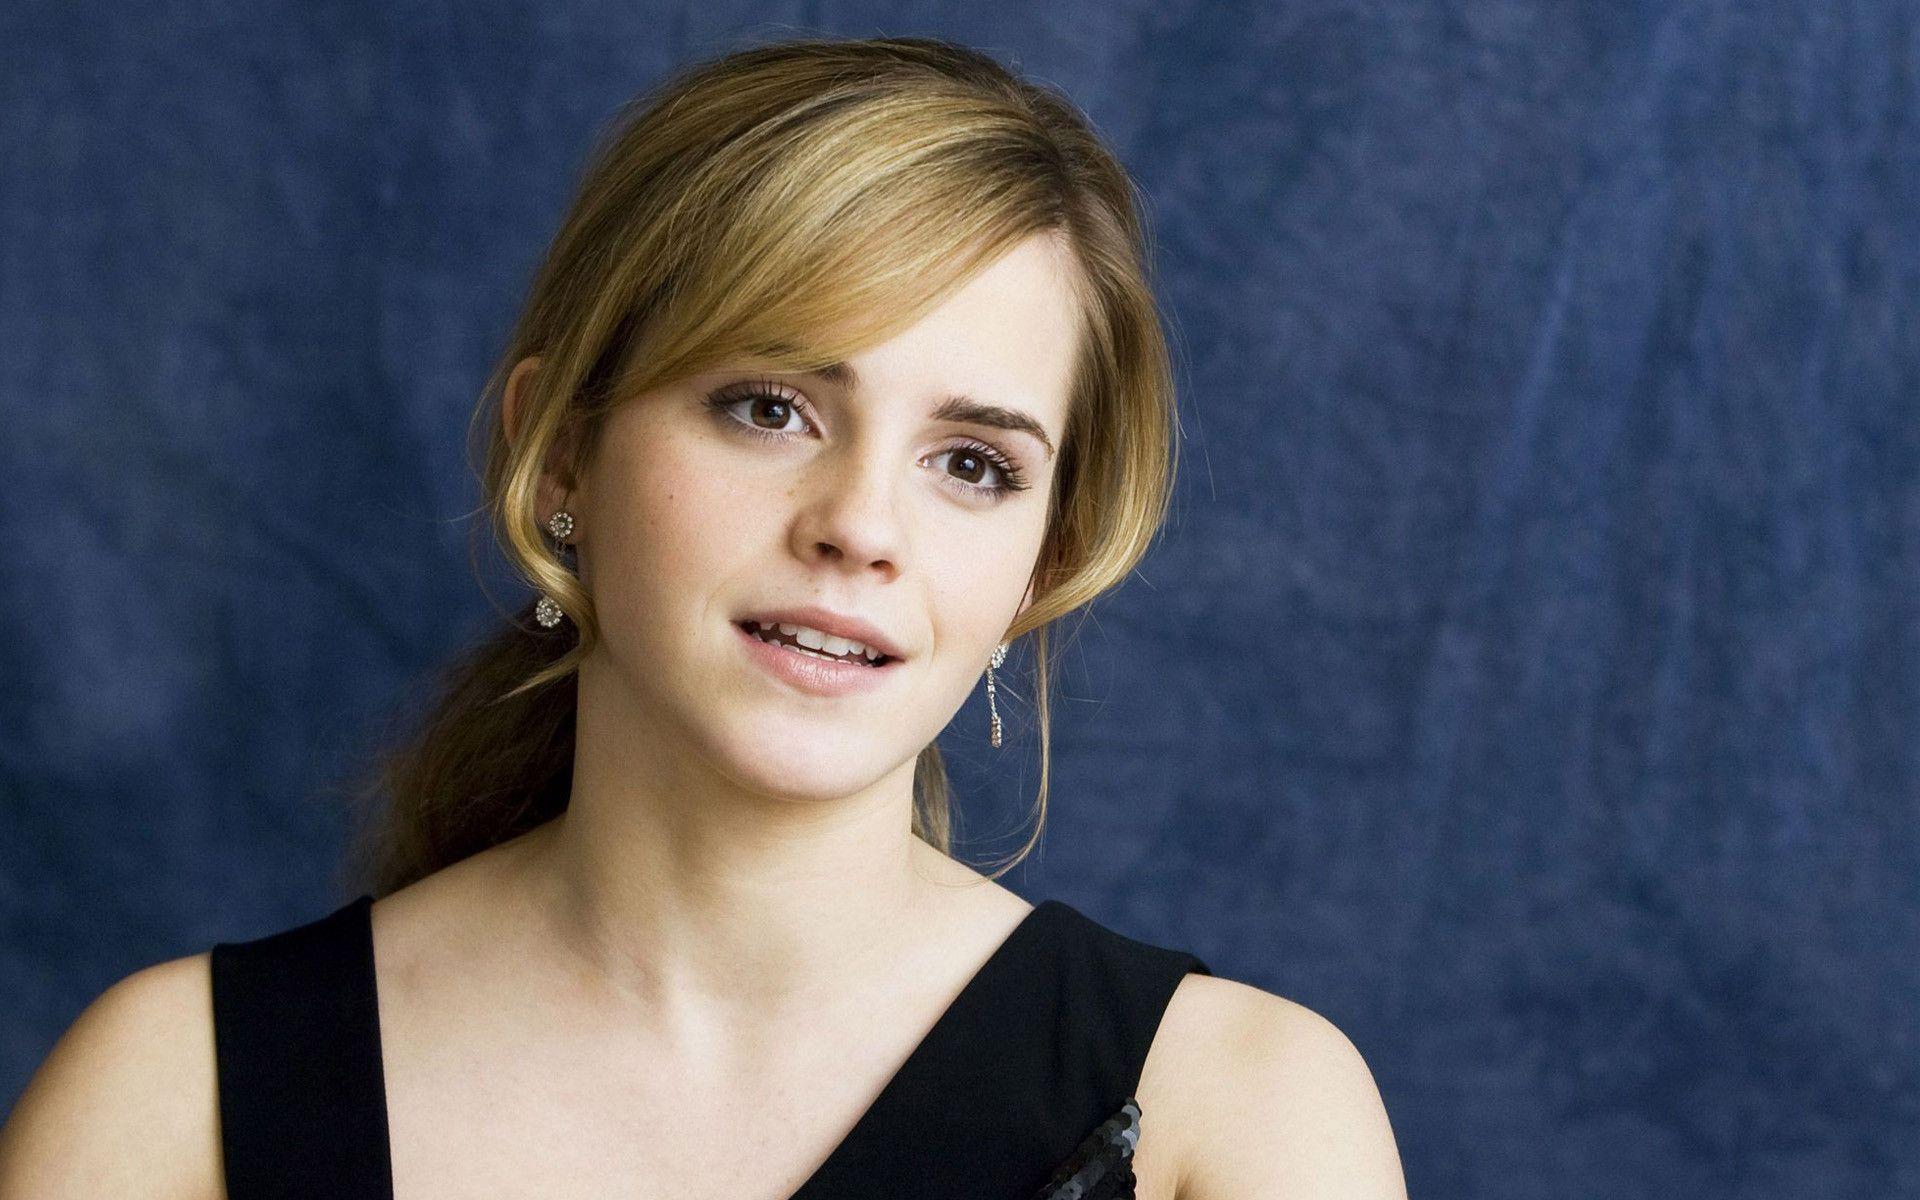 Emma Watson Wallpaper | Bulk HD Wallpapers